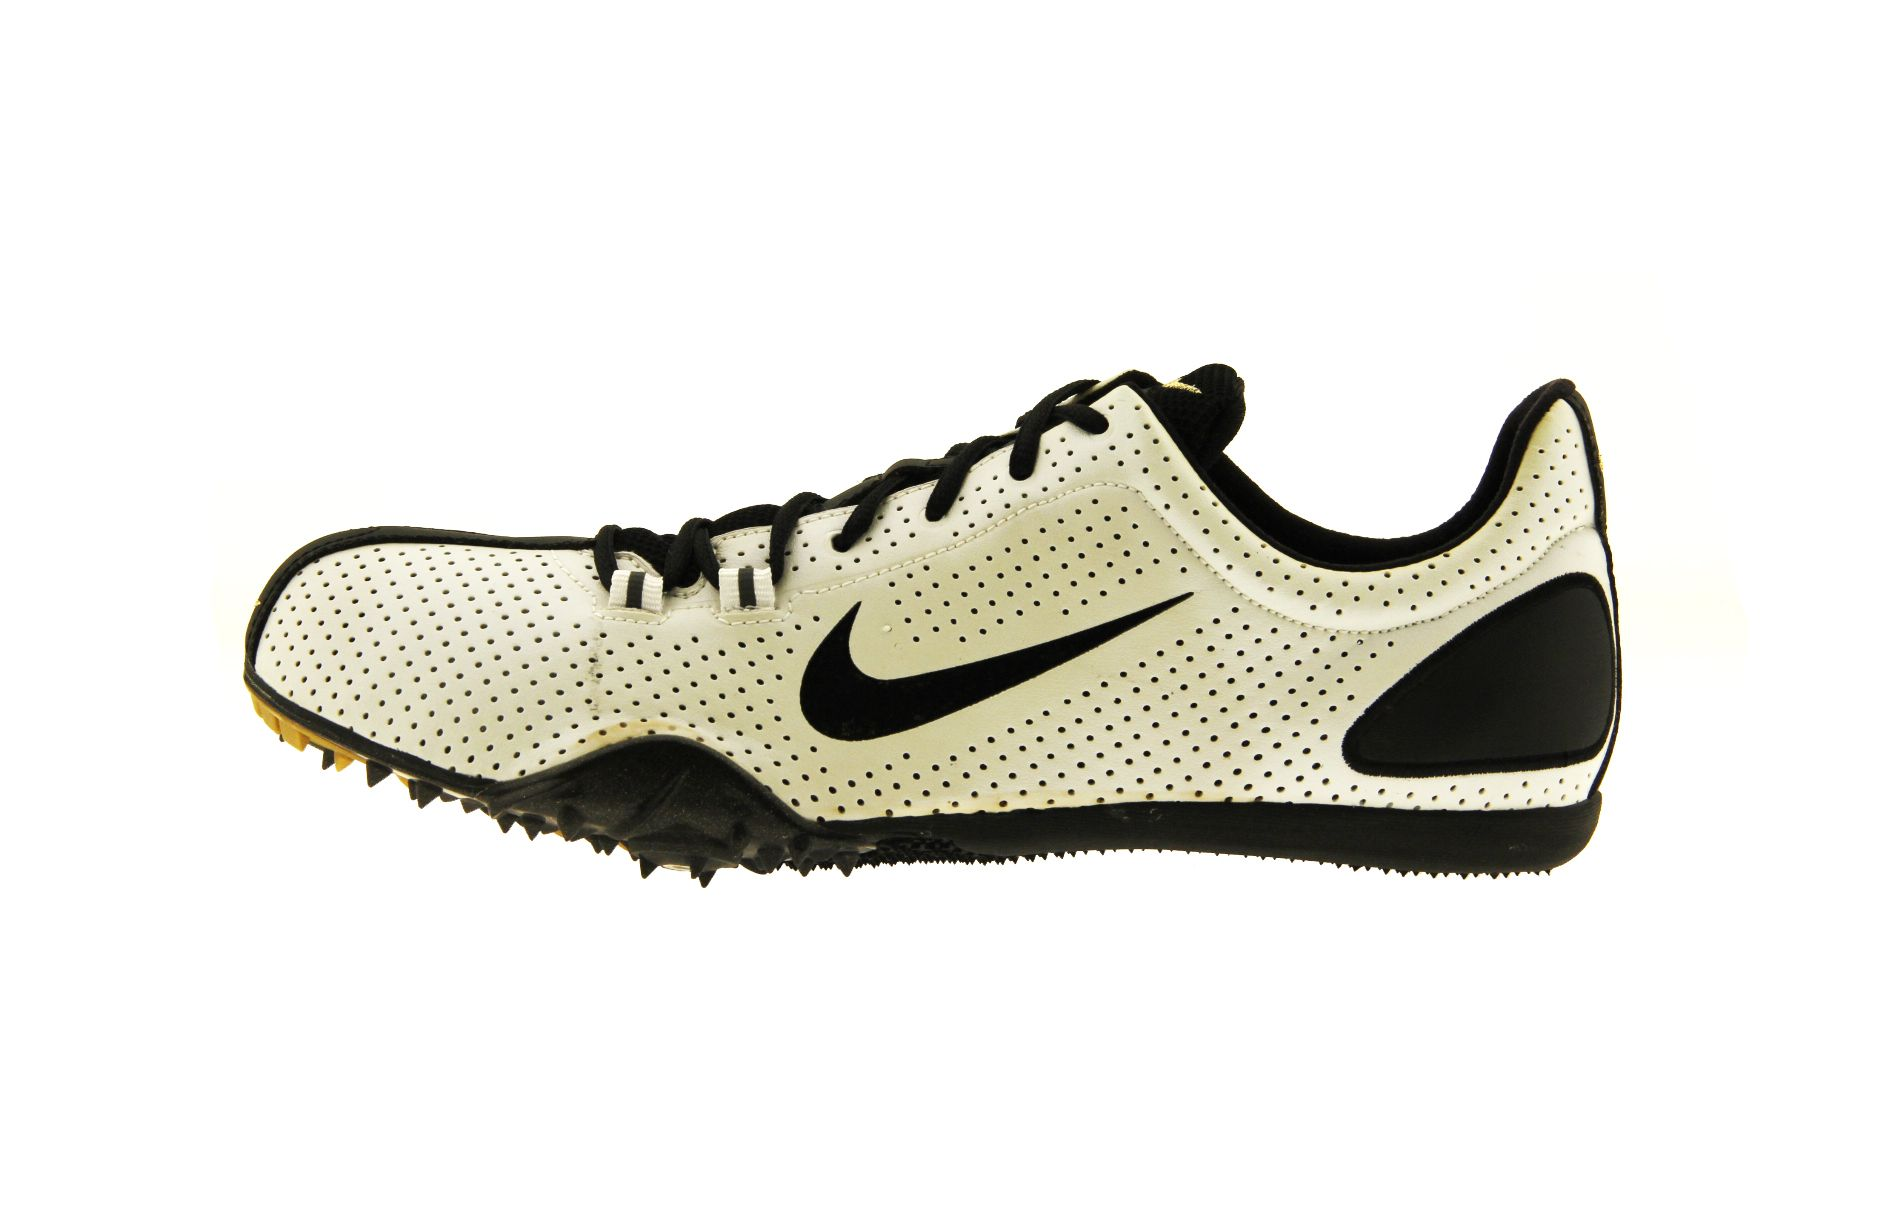 united kingdom new high quality autumn shoes The Visual History of the Nike Track Spike - Nike News